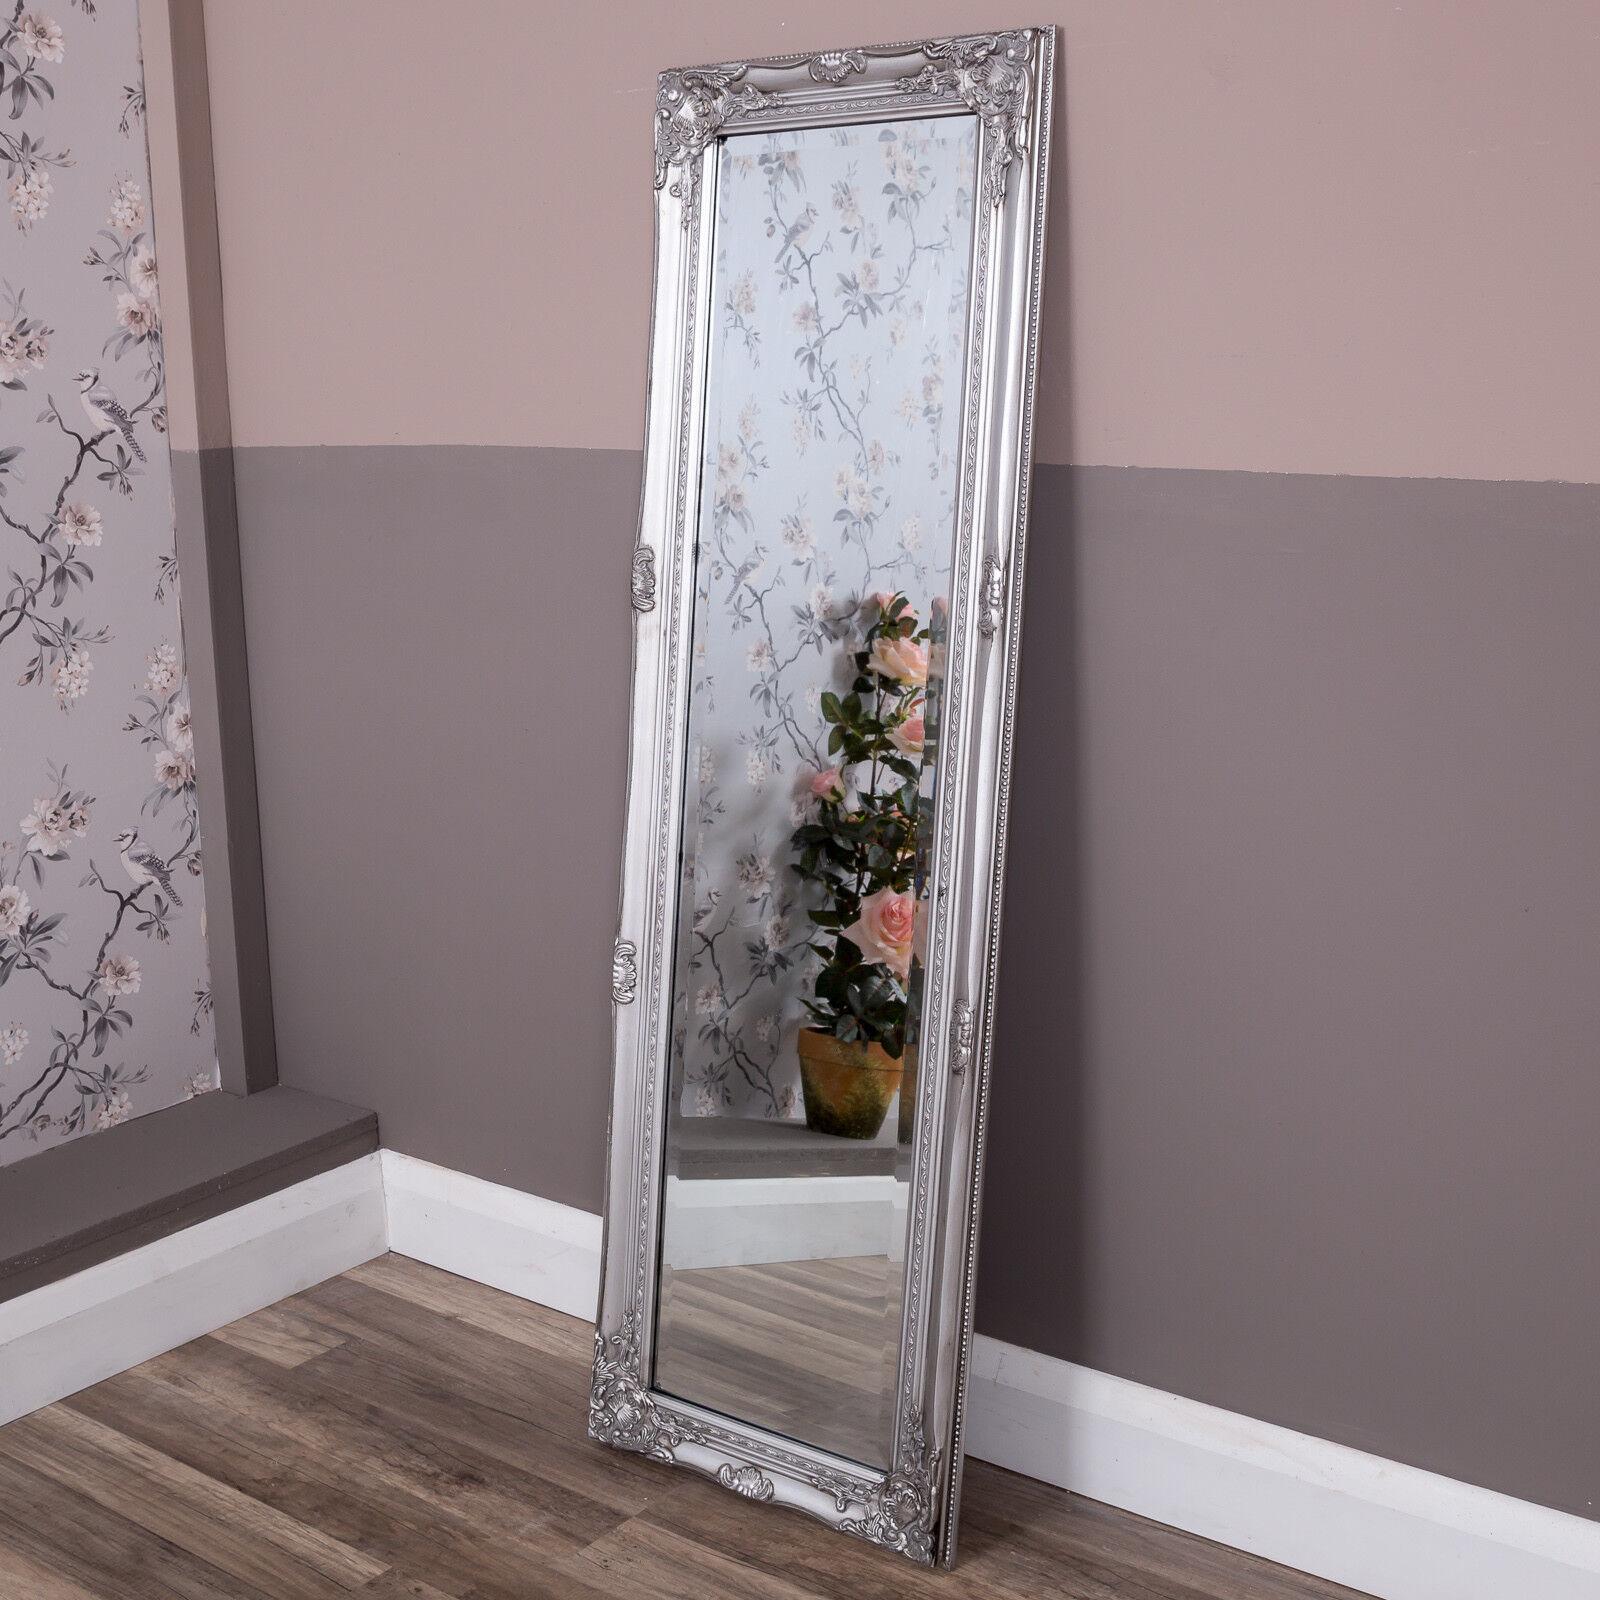 Tall slim silver wall mirror shabby vintage chic French ornate bedroom hallway